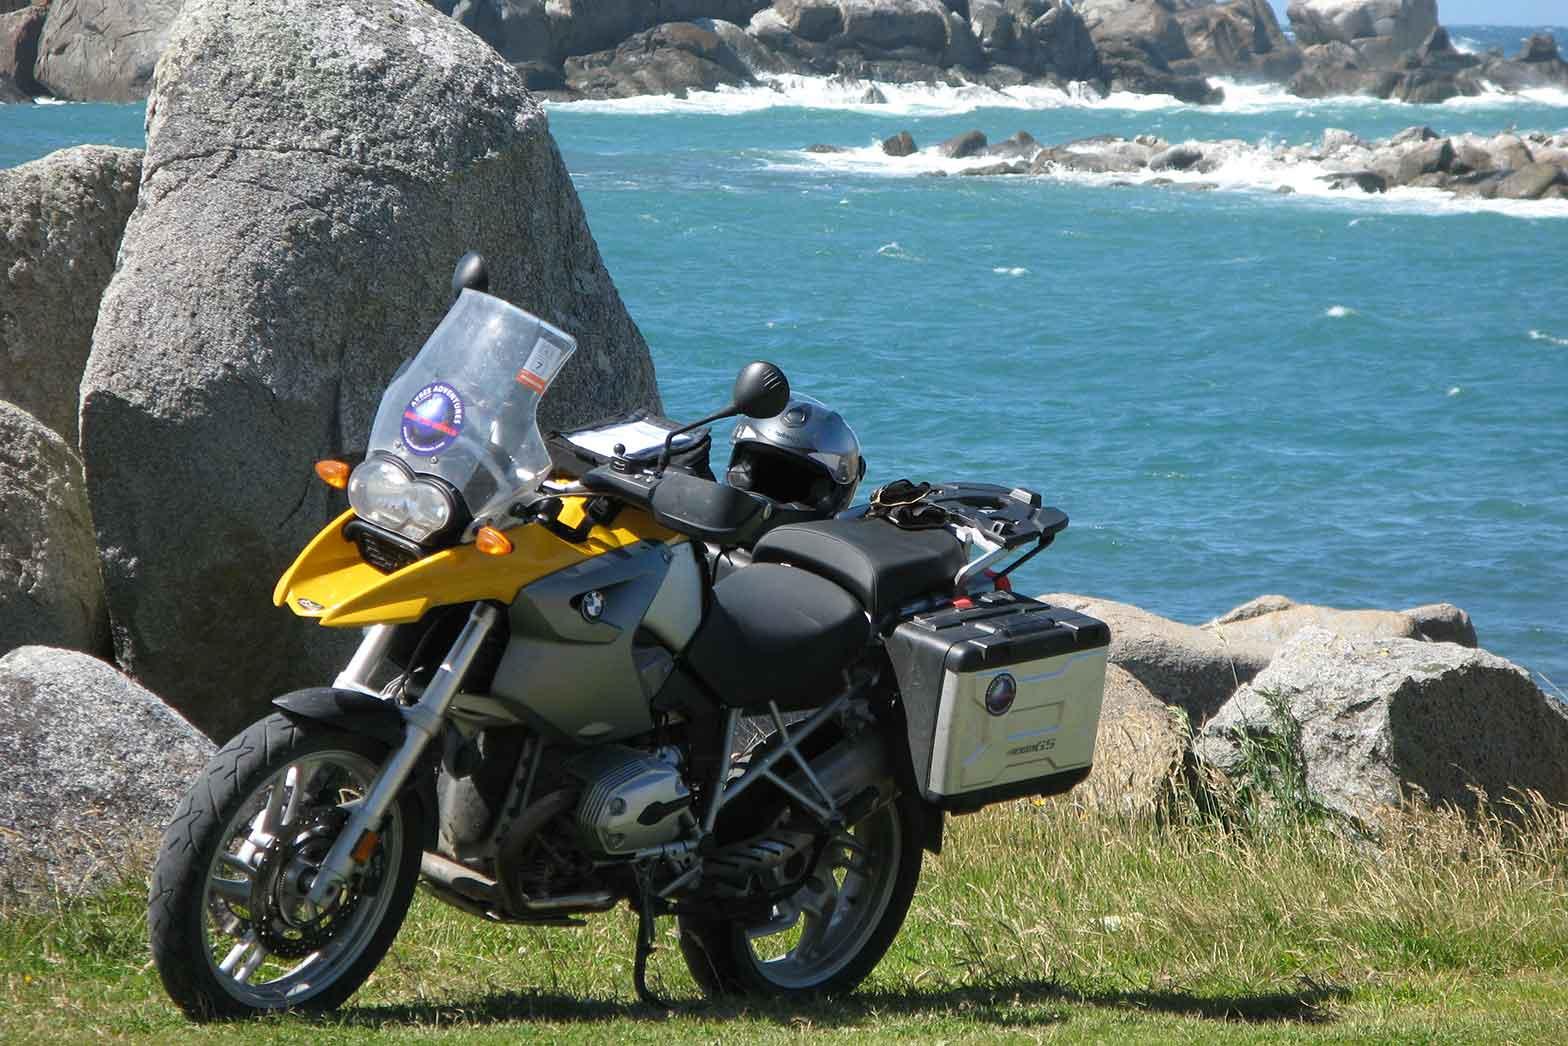 New Zealand bike beach scene